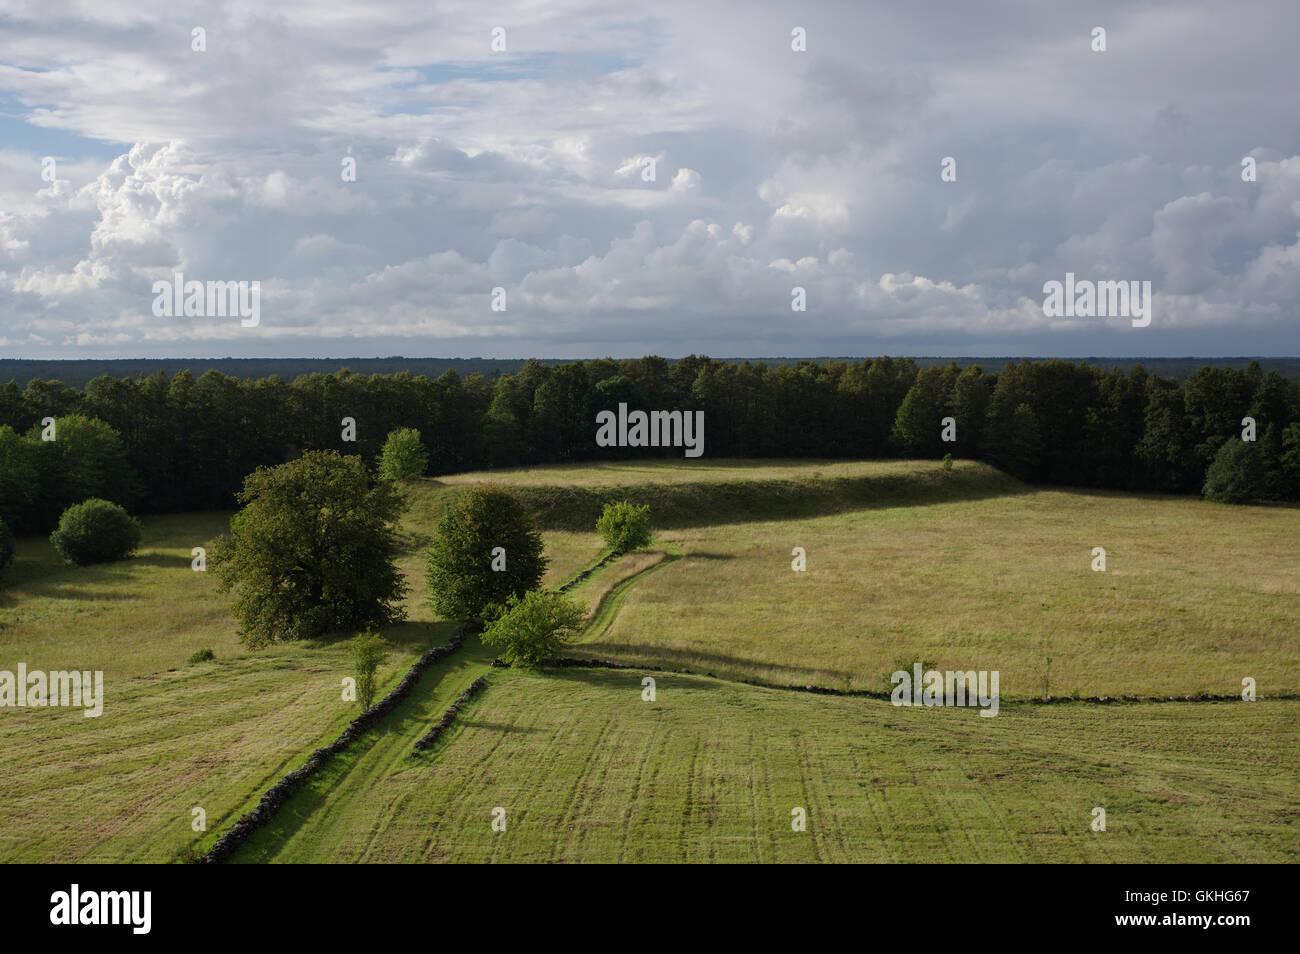 Soontagana Stronghold seen from Soontagana Watchtower. Pärnu county, Estonia - Stock Image